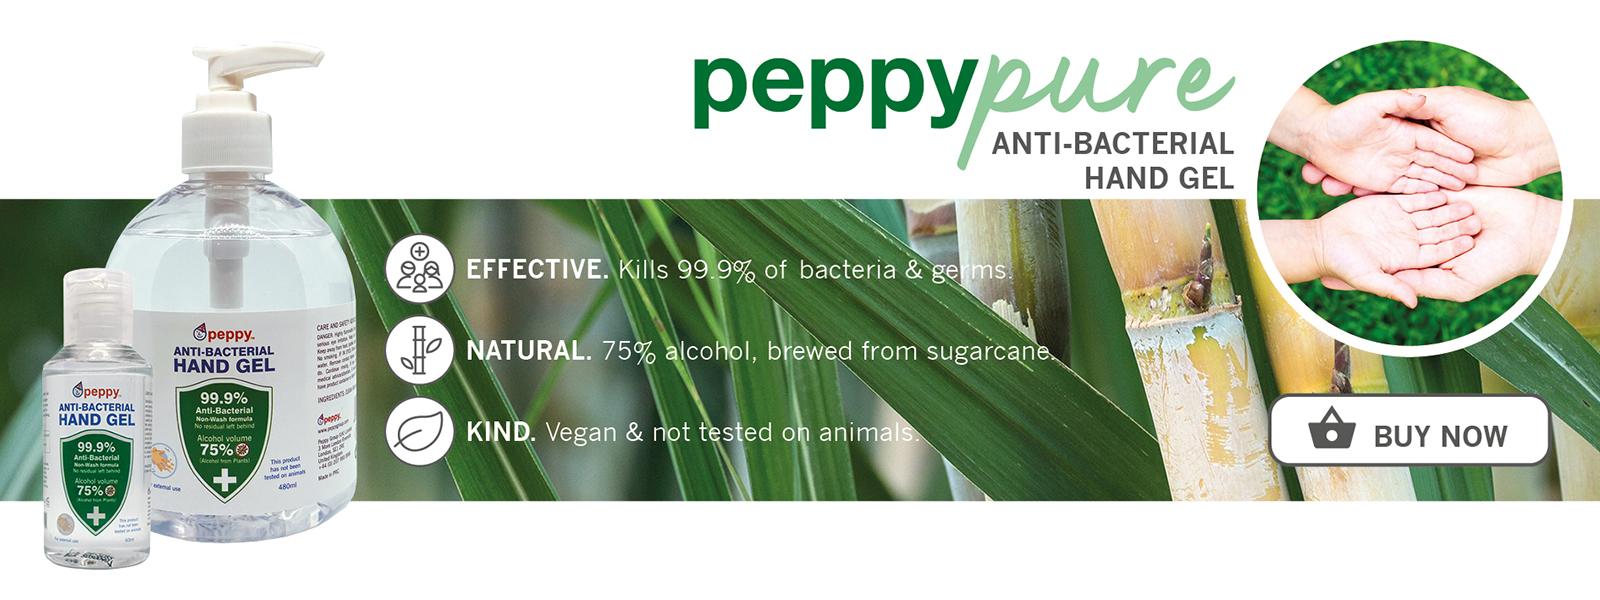 PeppyPure Anti-Bacterial Hand Gel